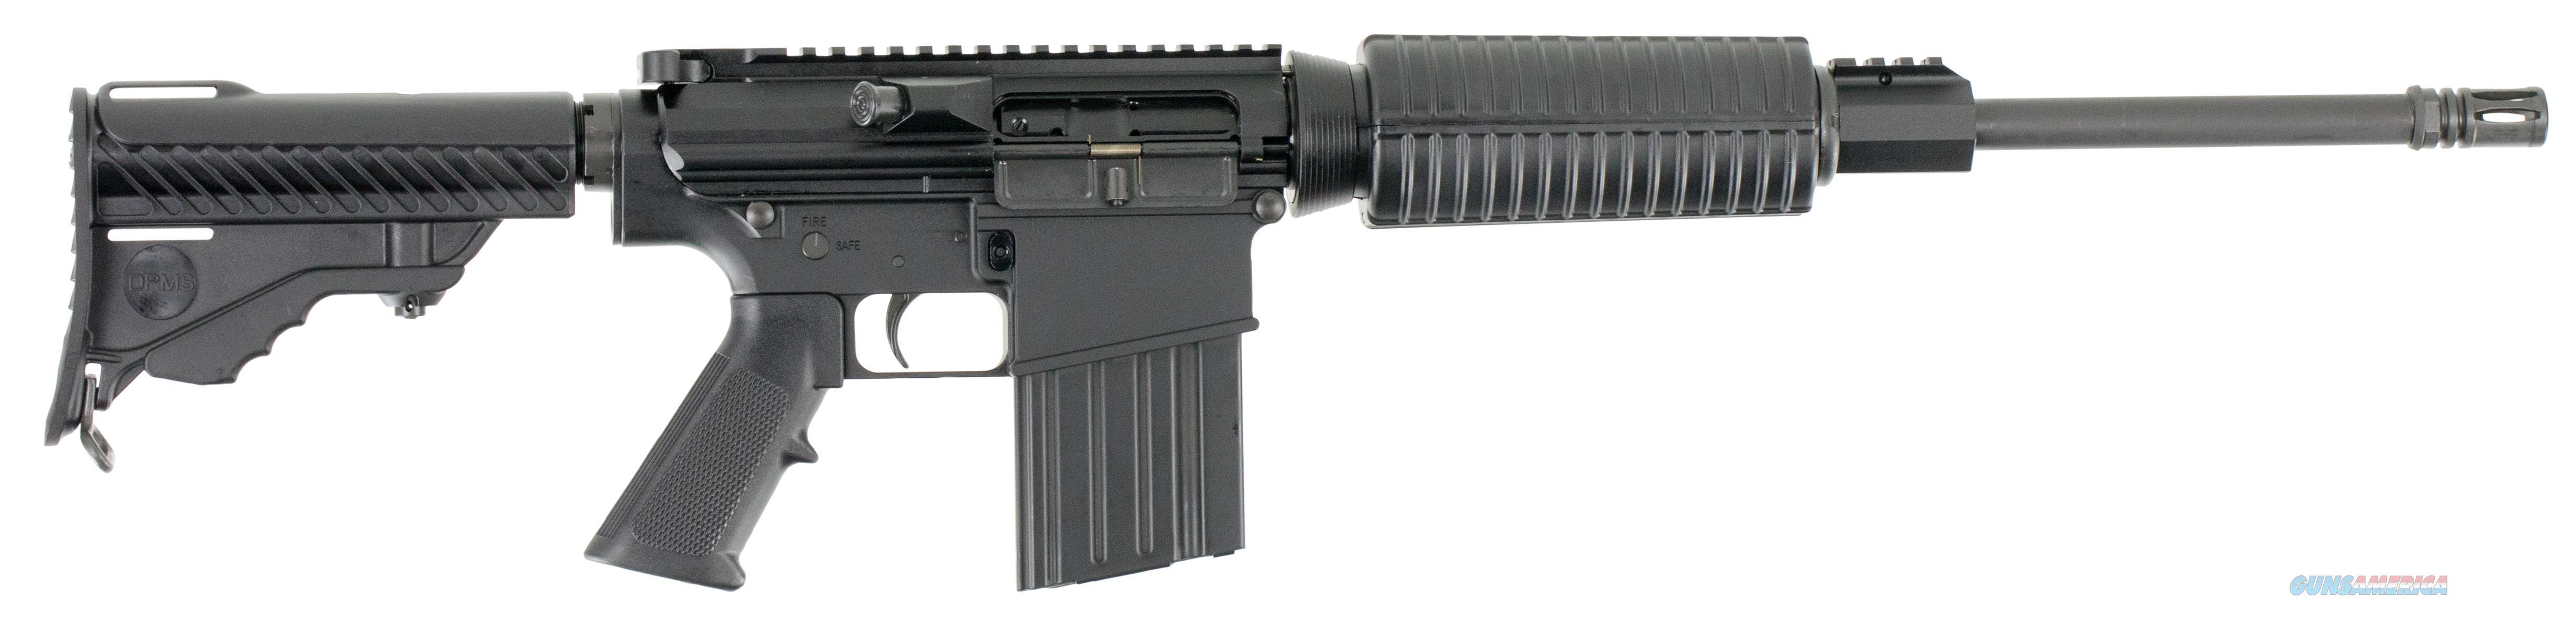 "Dpms  60560 Oracle Tactical Precision Semi-Automatic 308 Winchester/7.62 Nato 16"" 19+1  Pardus 6-Position Synthetic Black Stk Black 60560  Guns > Rifles > D Misc Rifles"